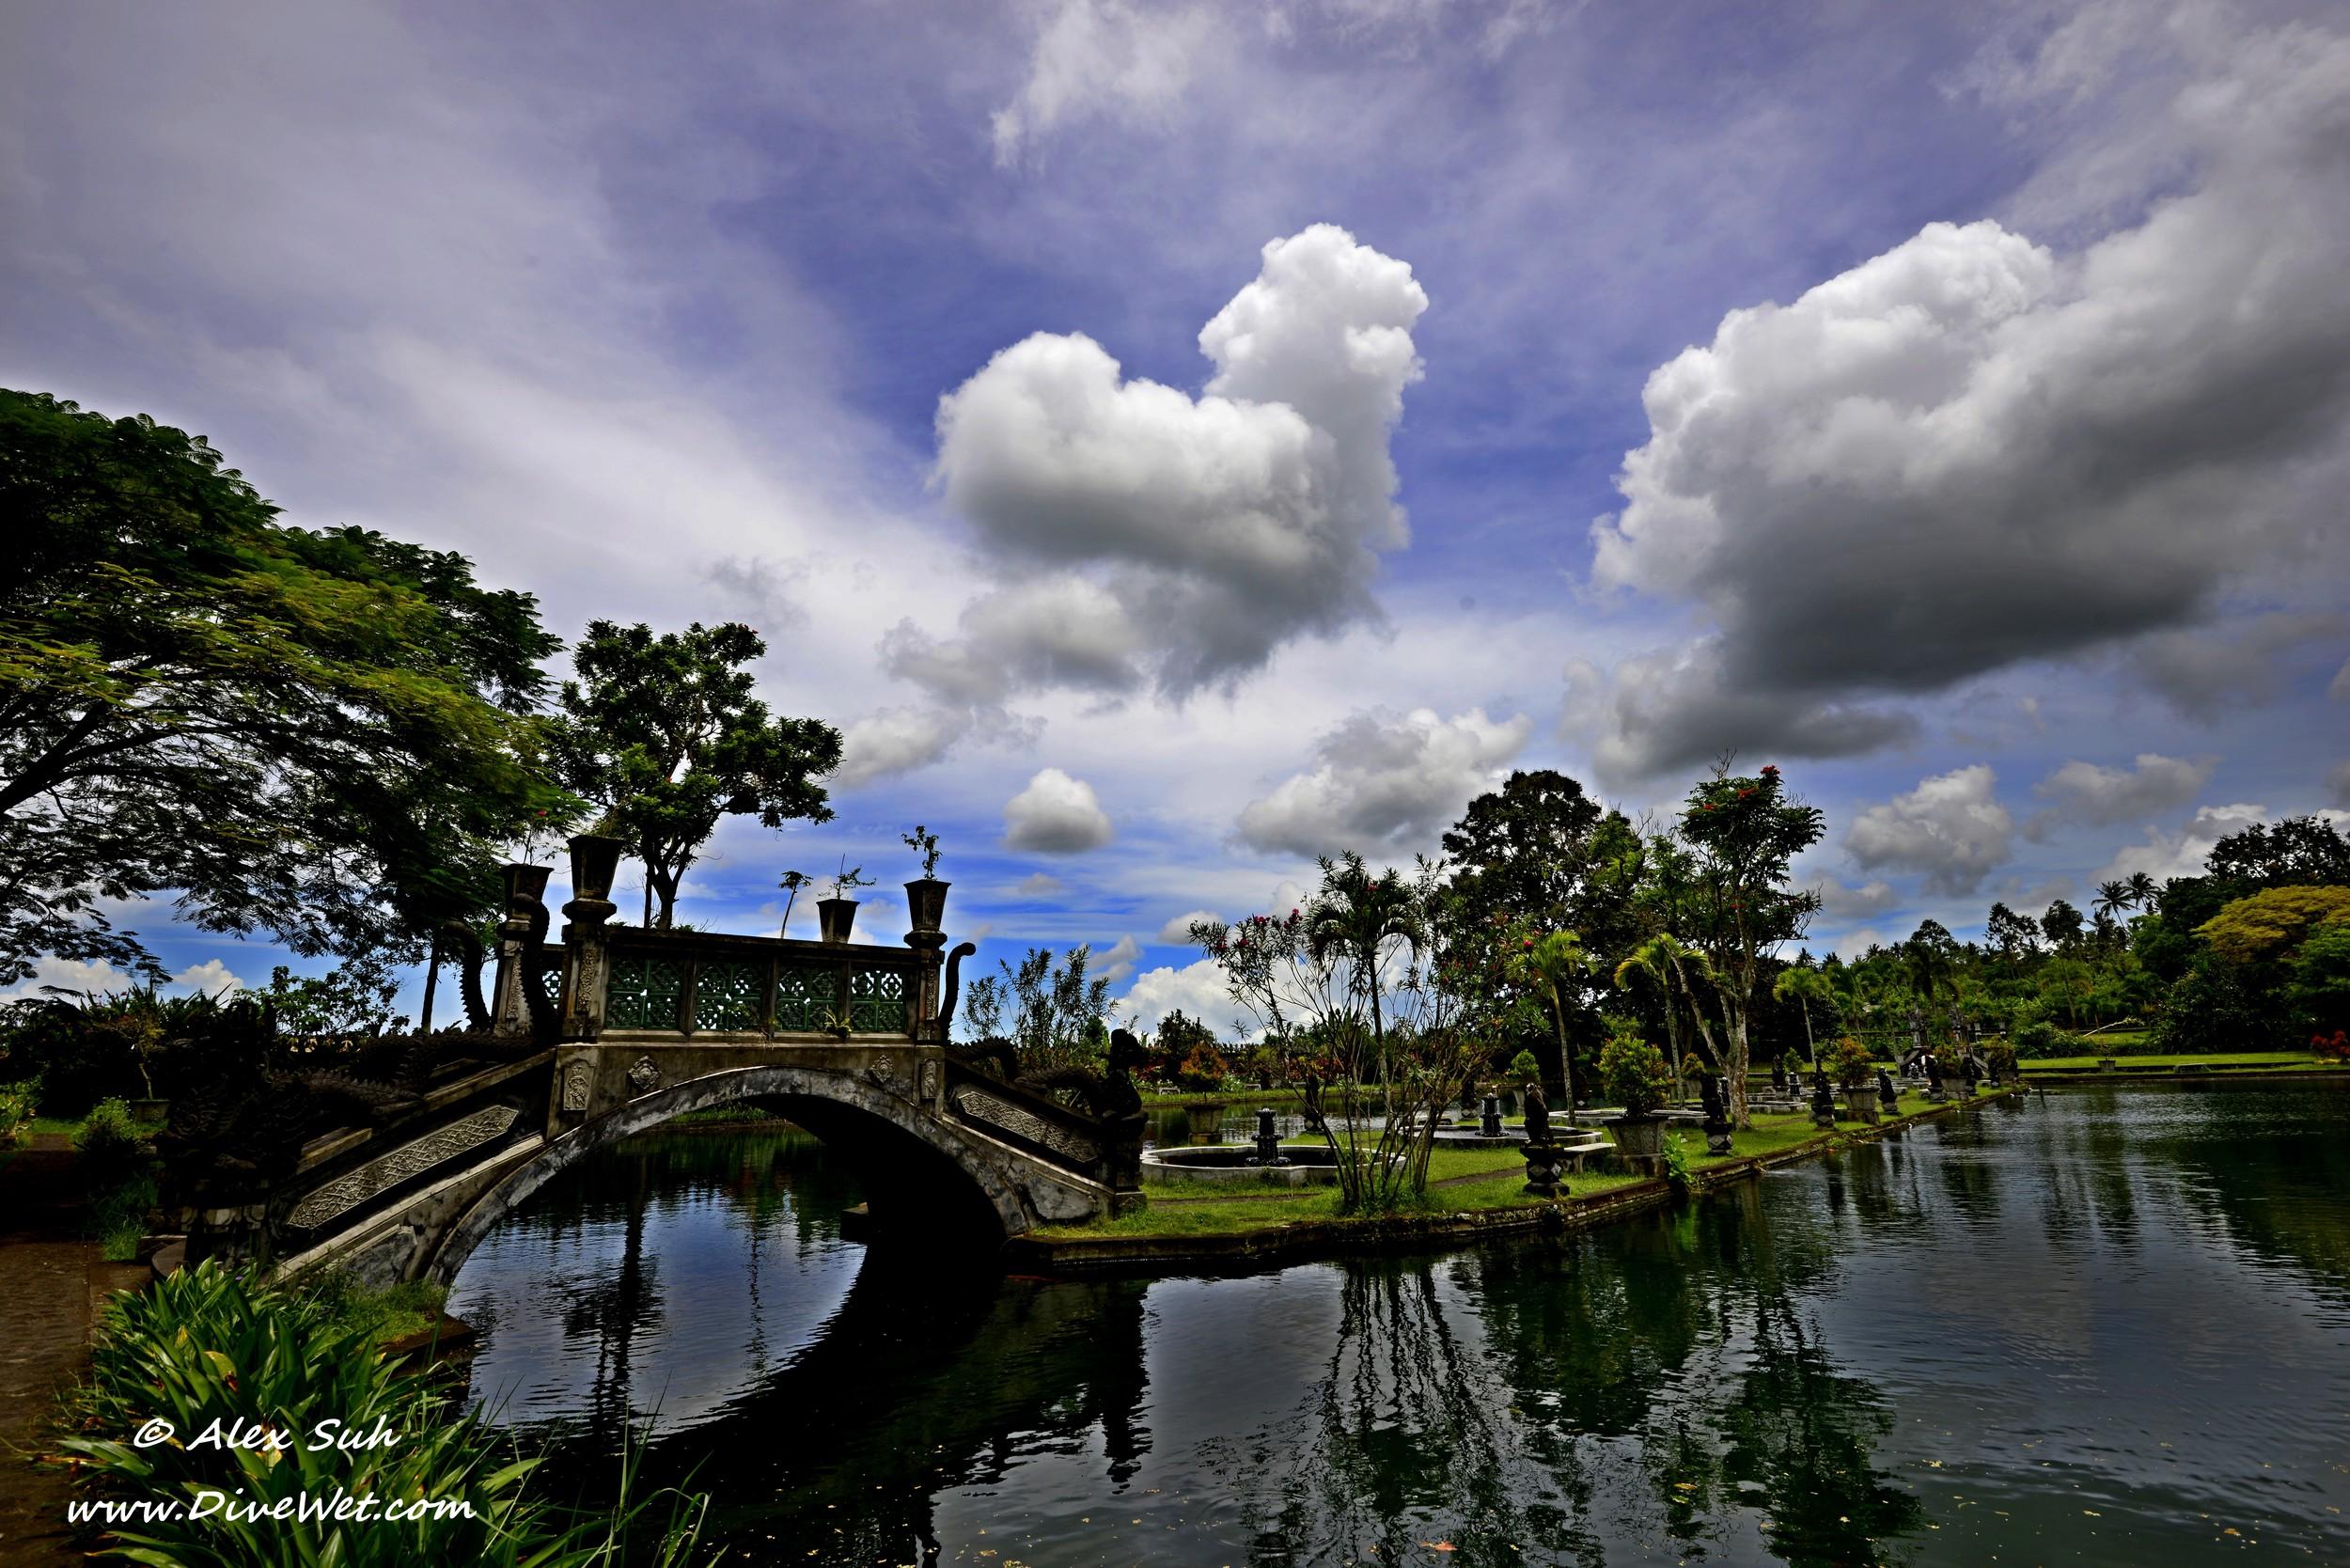 Bali Bridge Clouds Reflections.jpg